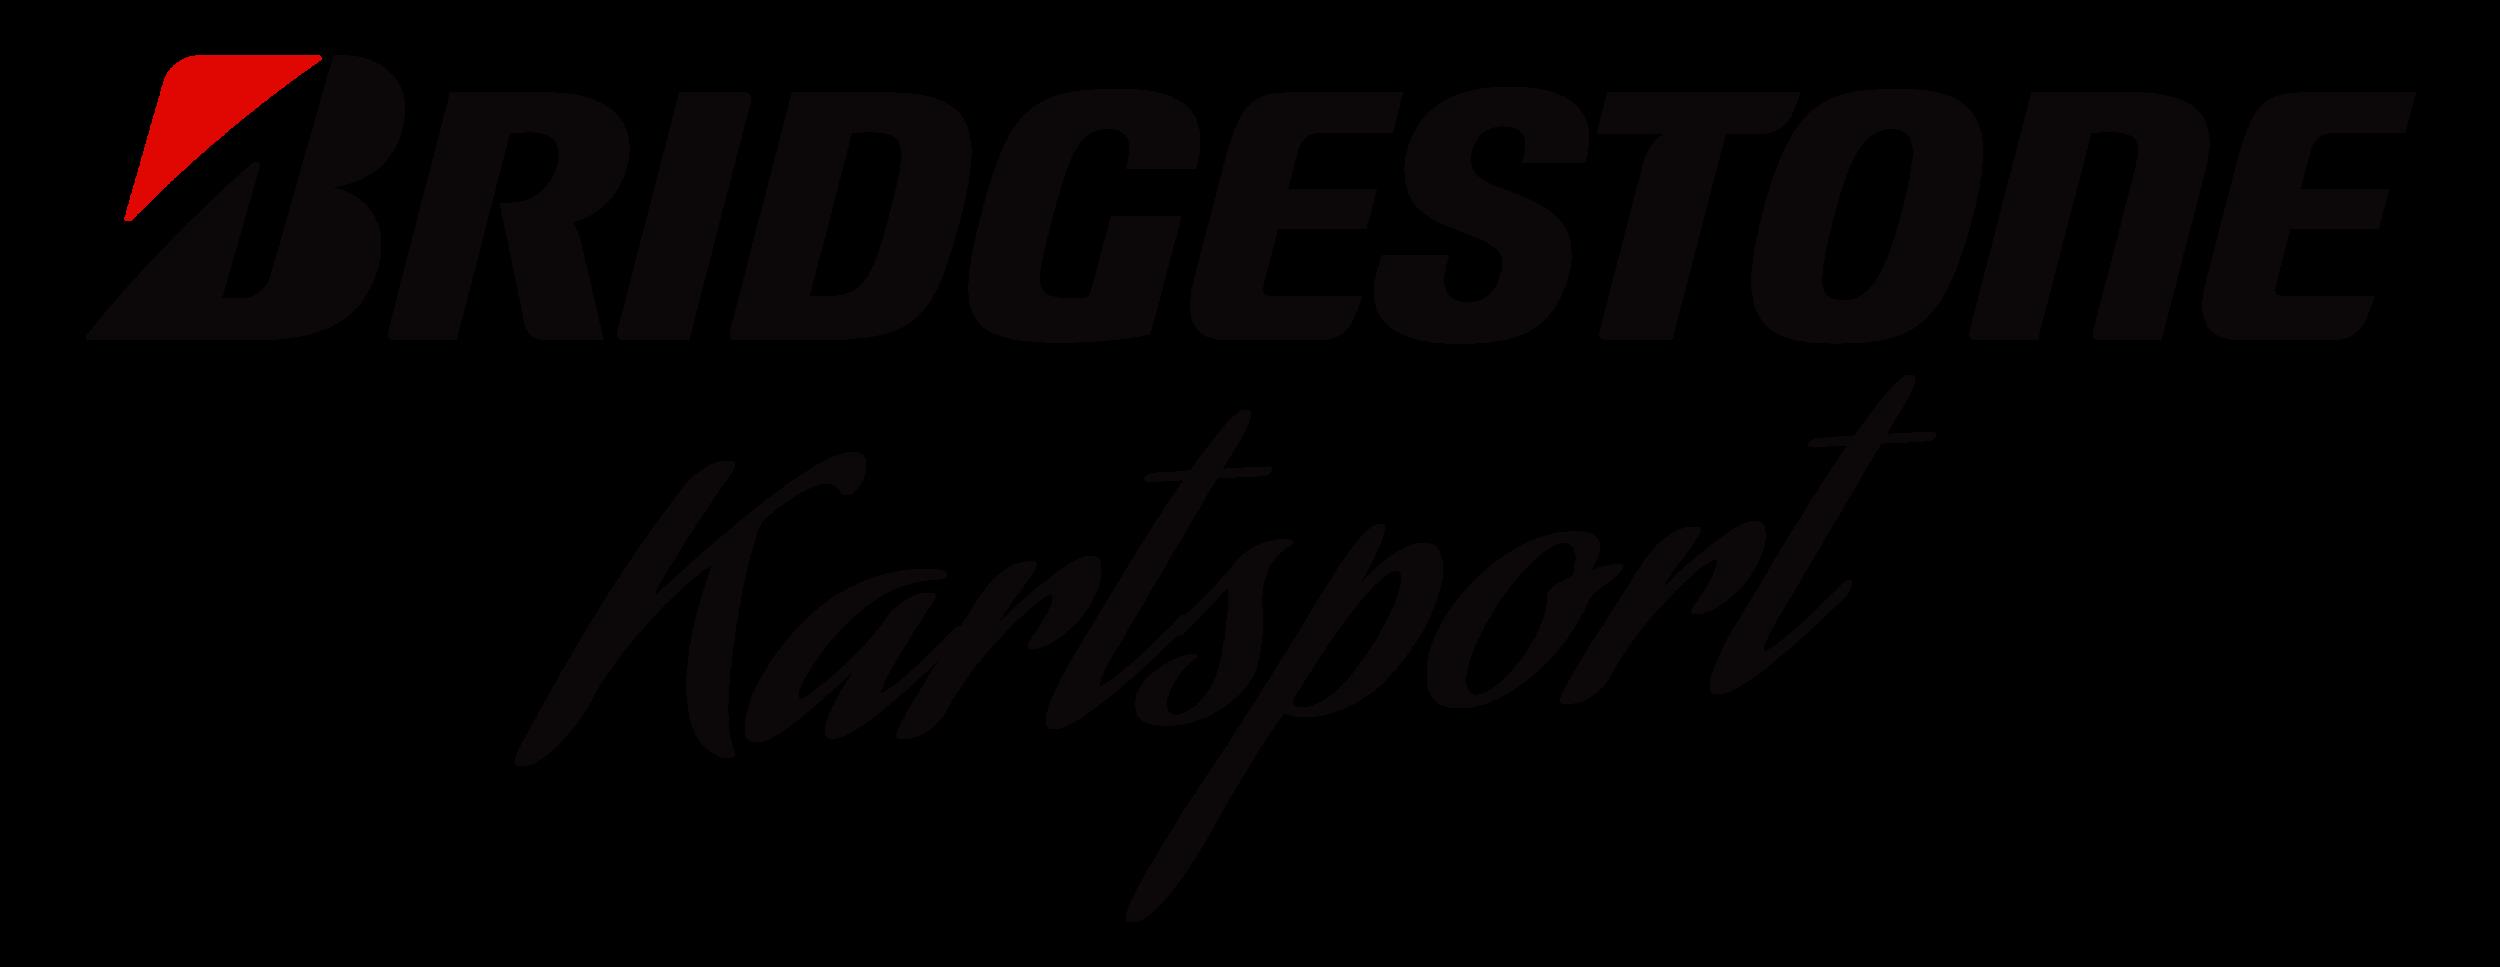 Bridgestone Kartsport Logo.png